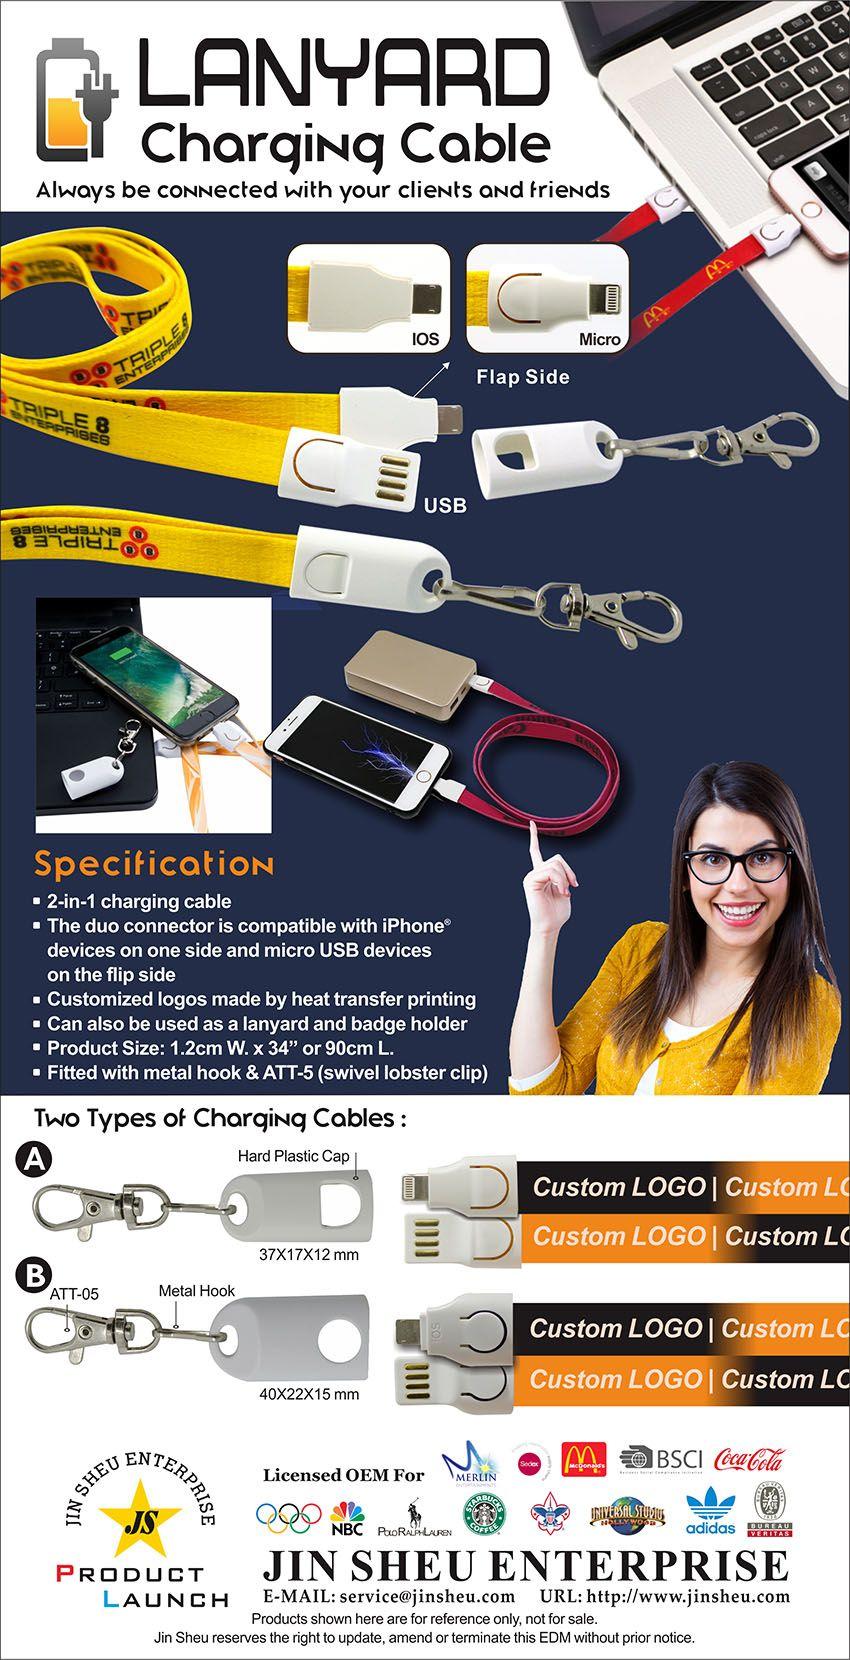 Charging Cable Lanyard